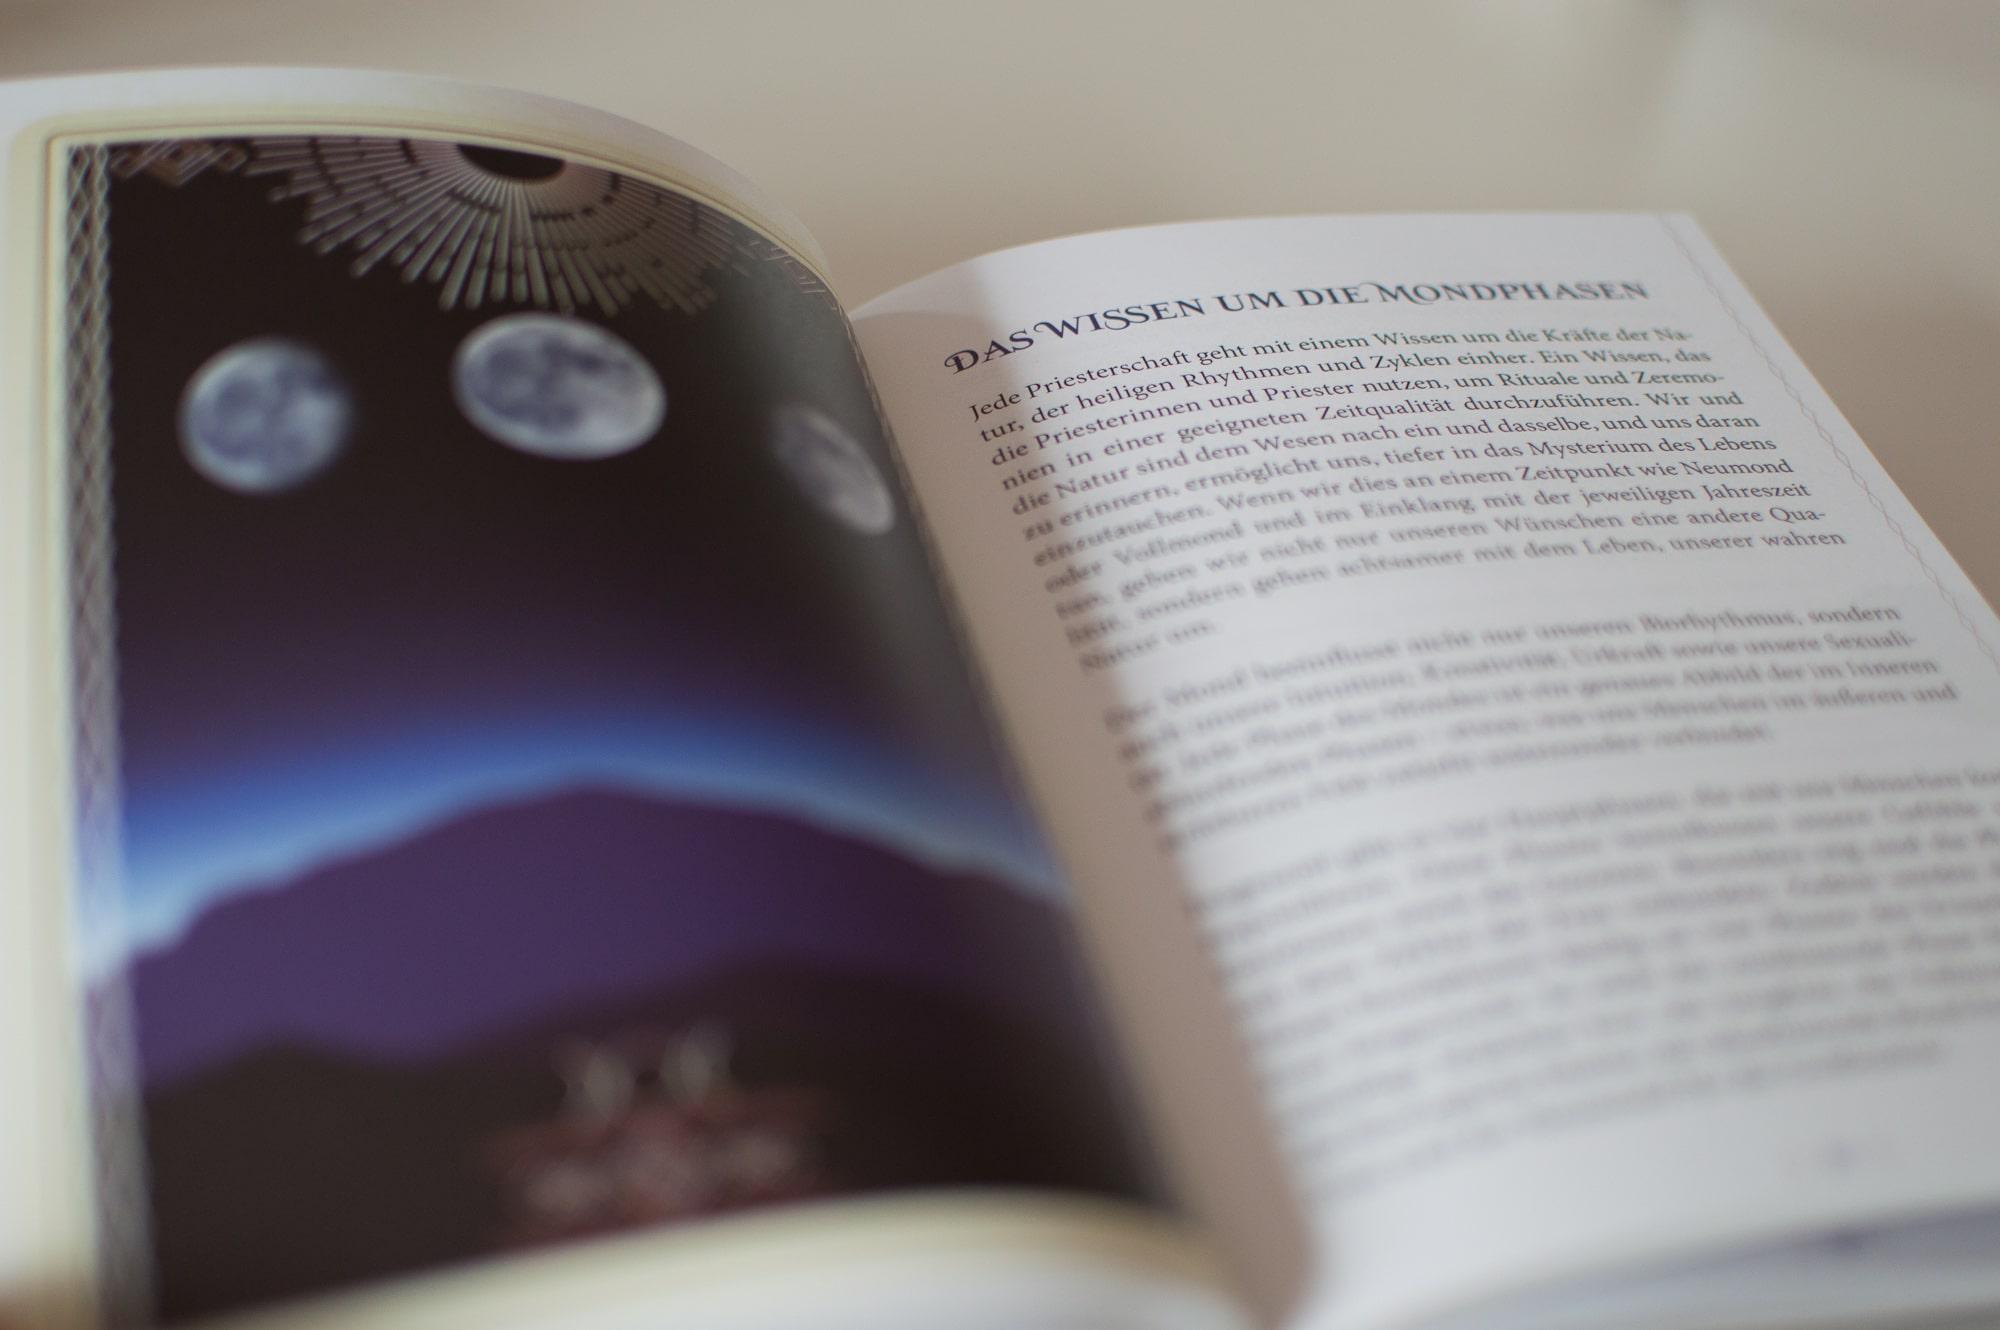 Mondpriesterschaft, Buch, Schirner Verlag, Rituale, Mond